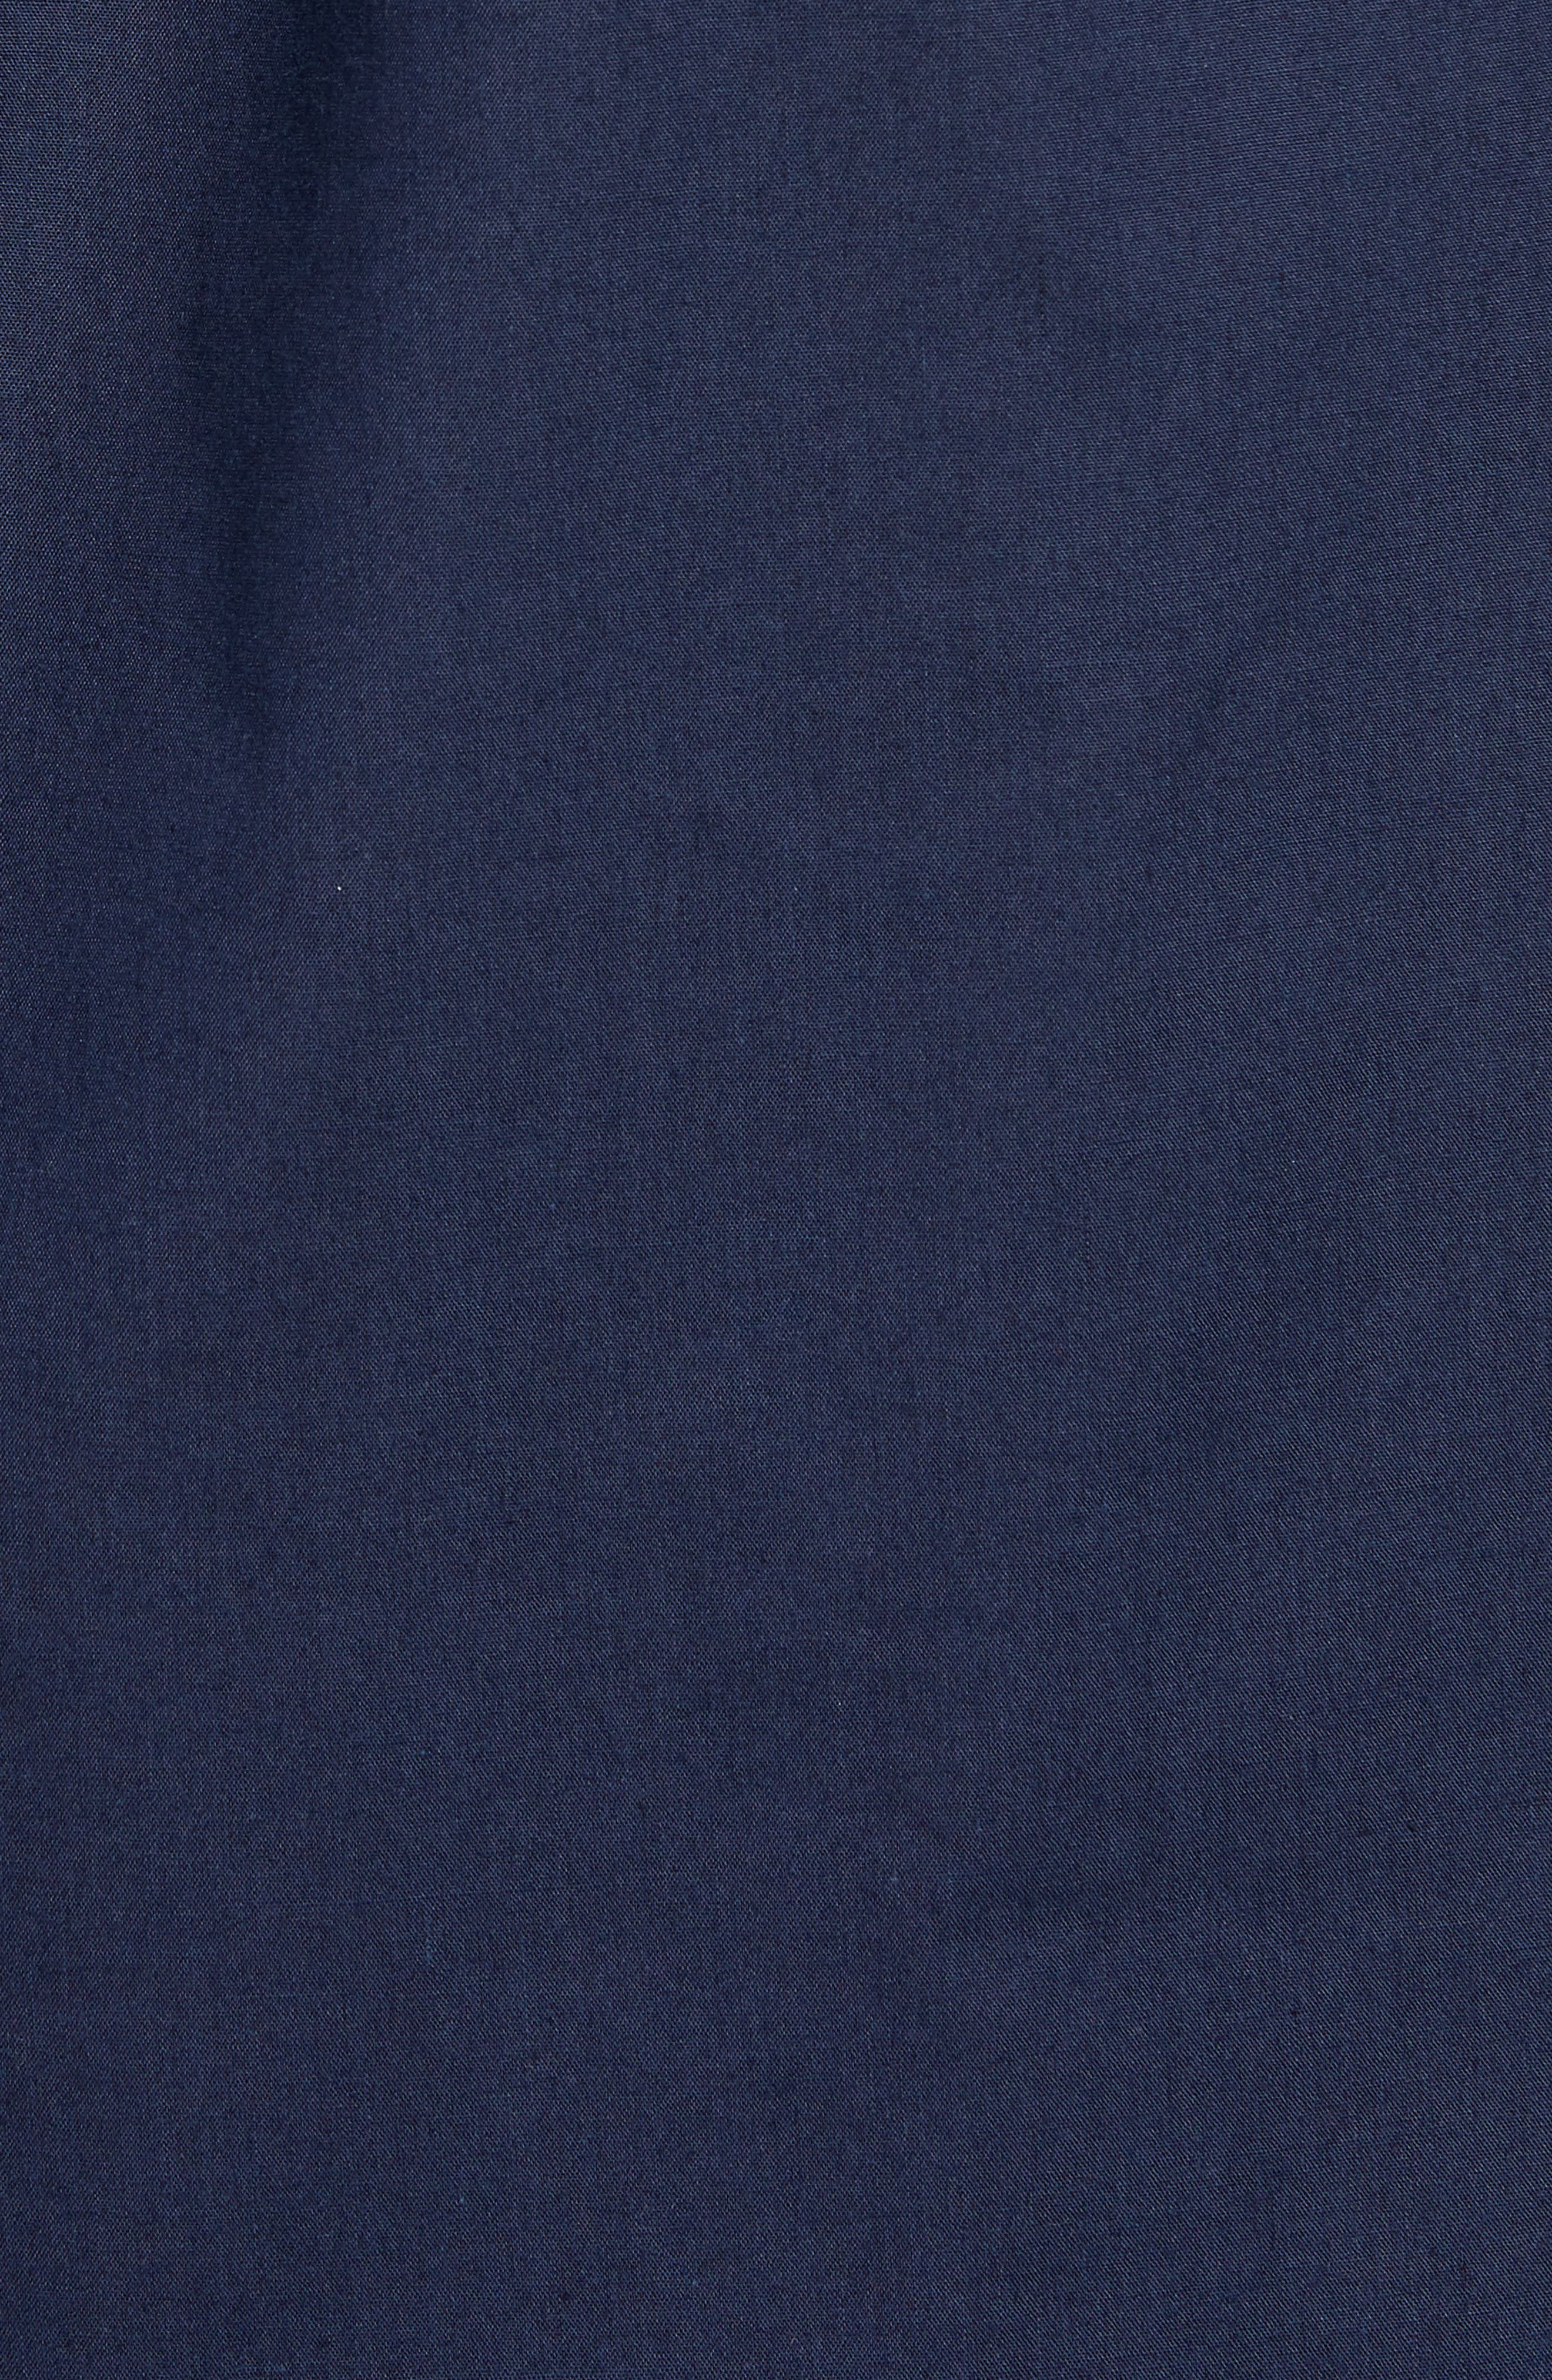 Howl Woven Shirt,                             Alternate thumbnail 5, color,                             NAVY